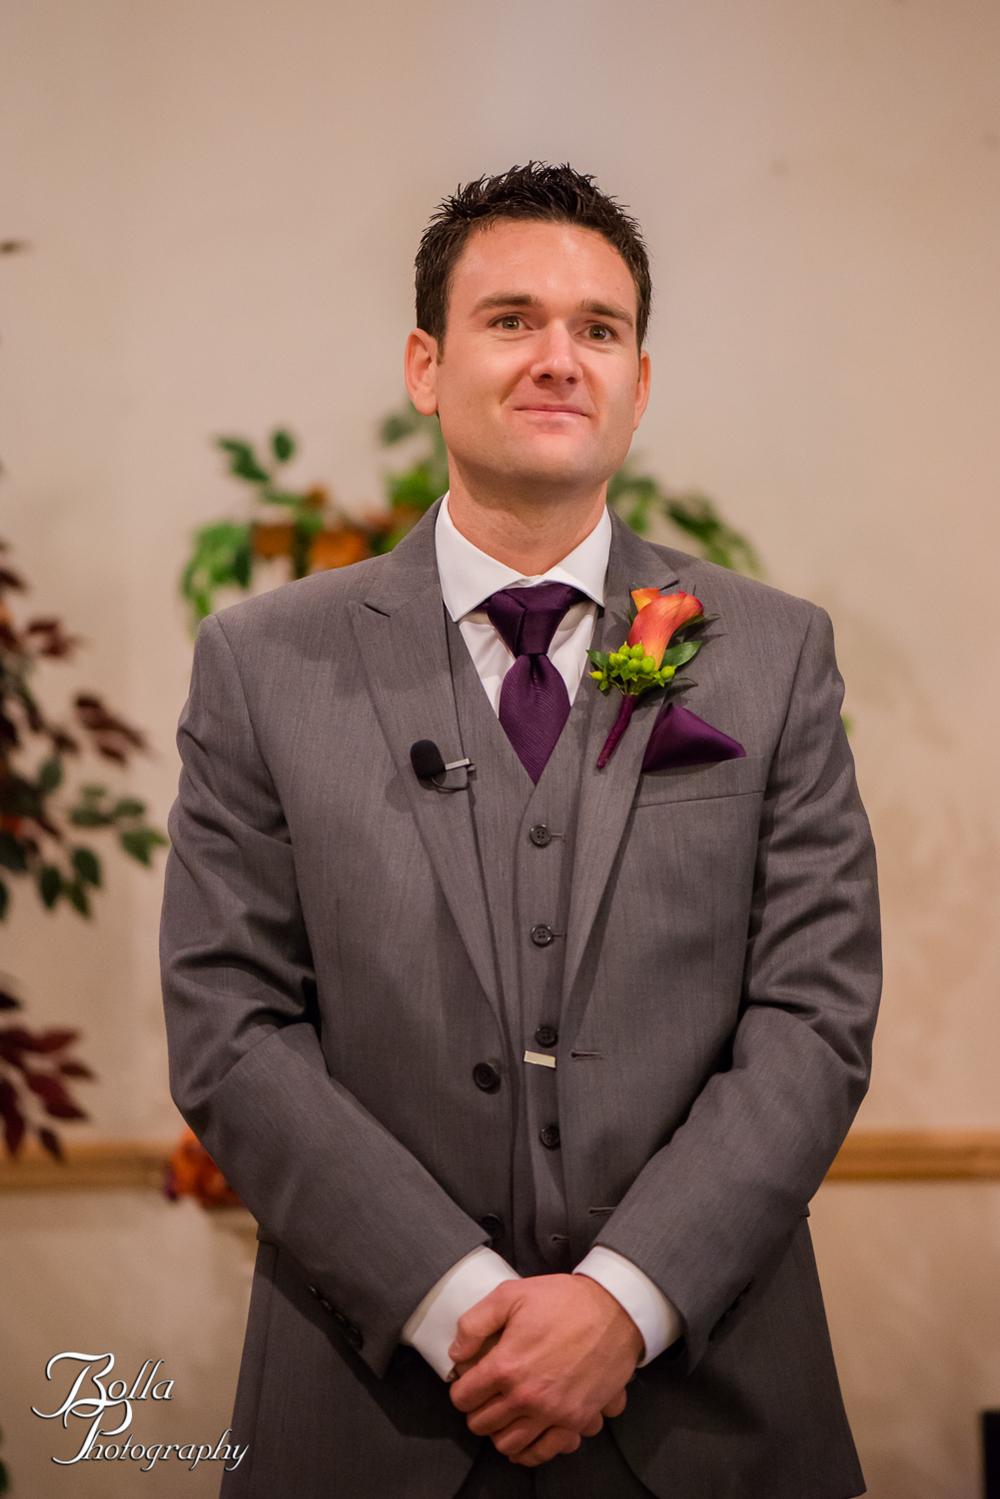 Bolla_Photography_St_Louis_wedding_photographer-0154.jpg